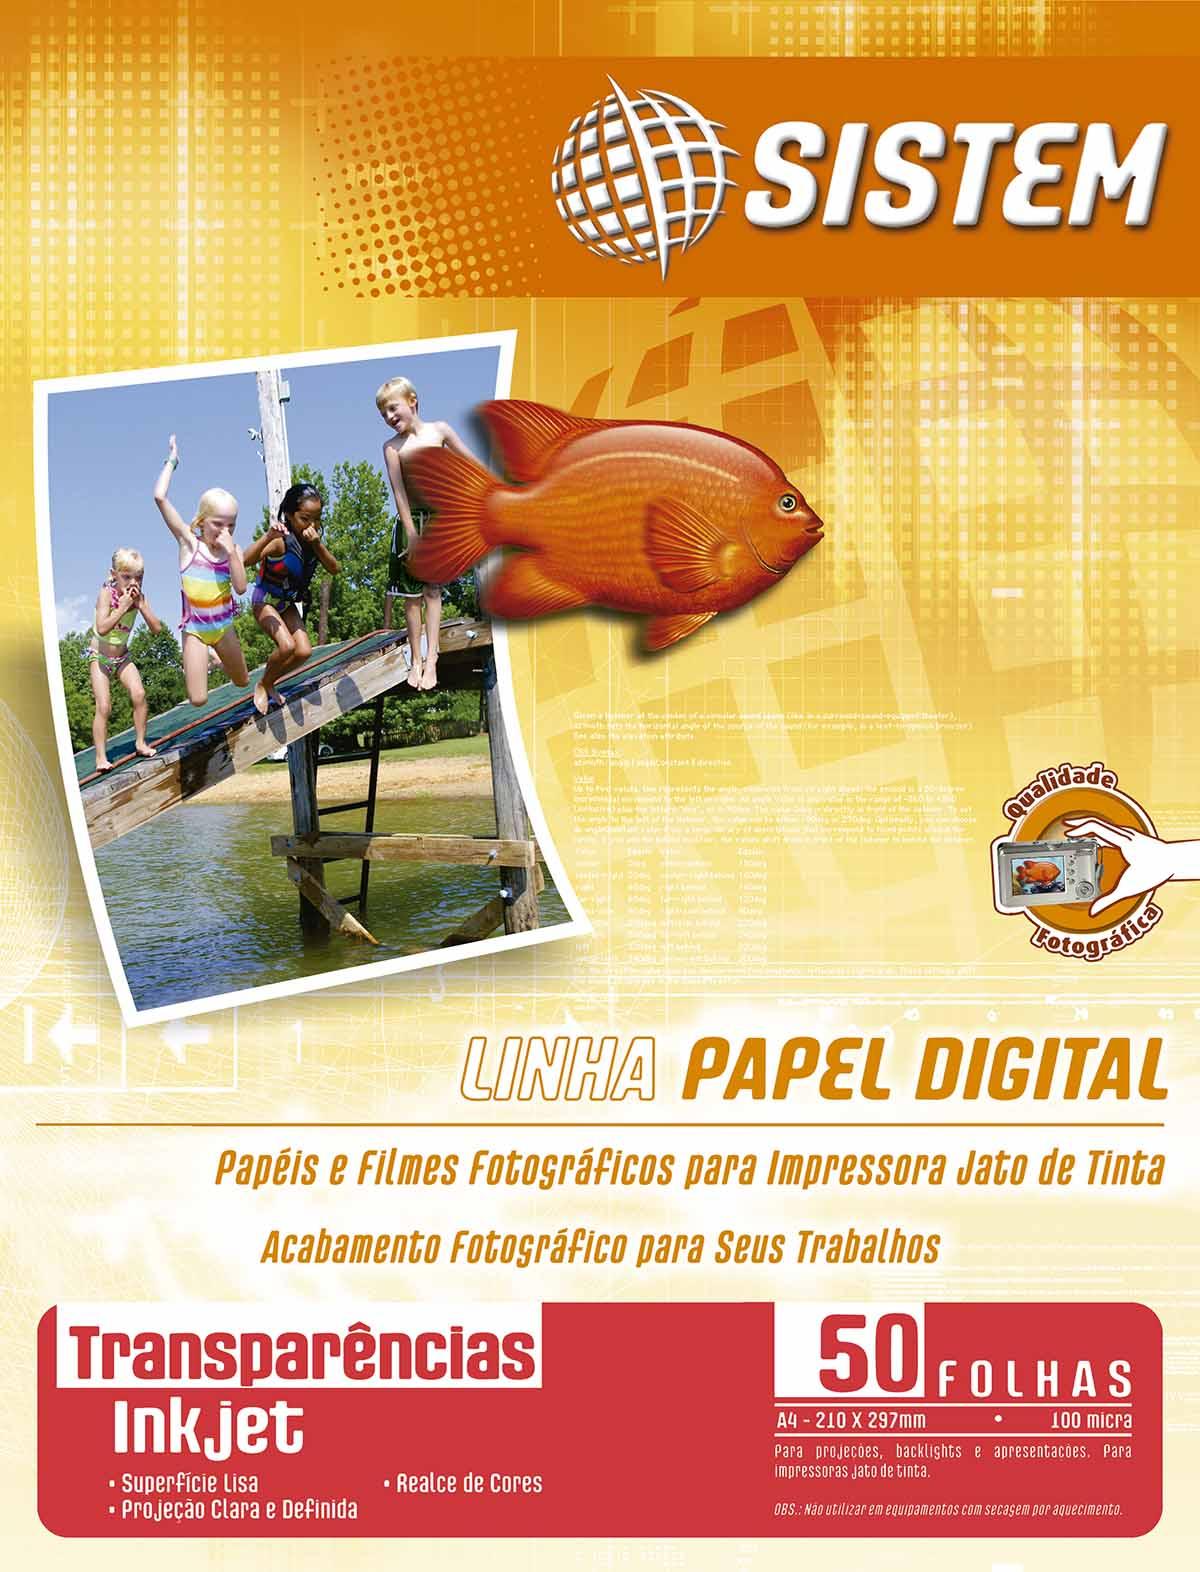 TRANSPARÊNCIA Inkjet Sem Tarja | Carta | 100 micra | 50 Folhas